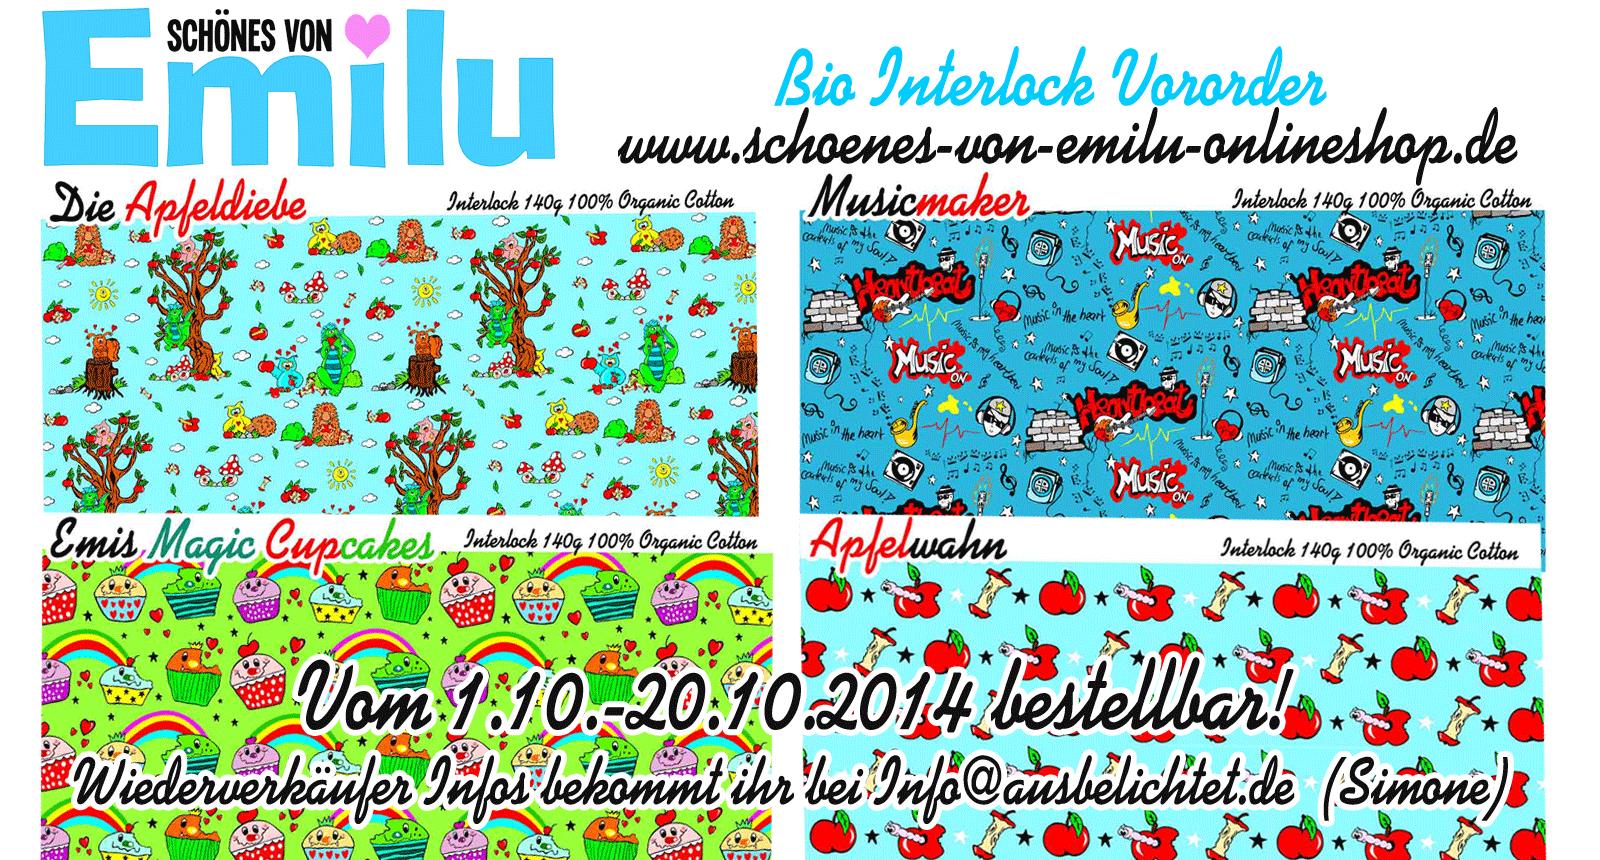 http://www.schoenes-von-emilu-onlineshop.de/epages/63605954.sf/de_DE/?ObjectPath=/Shops/63605954/Categories/Category3